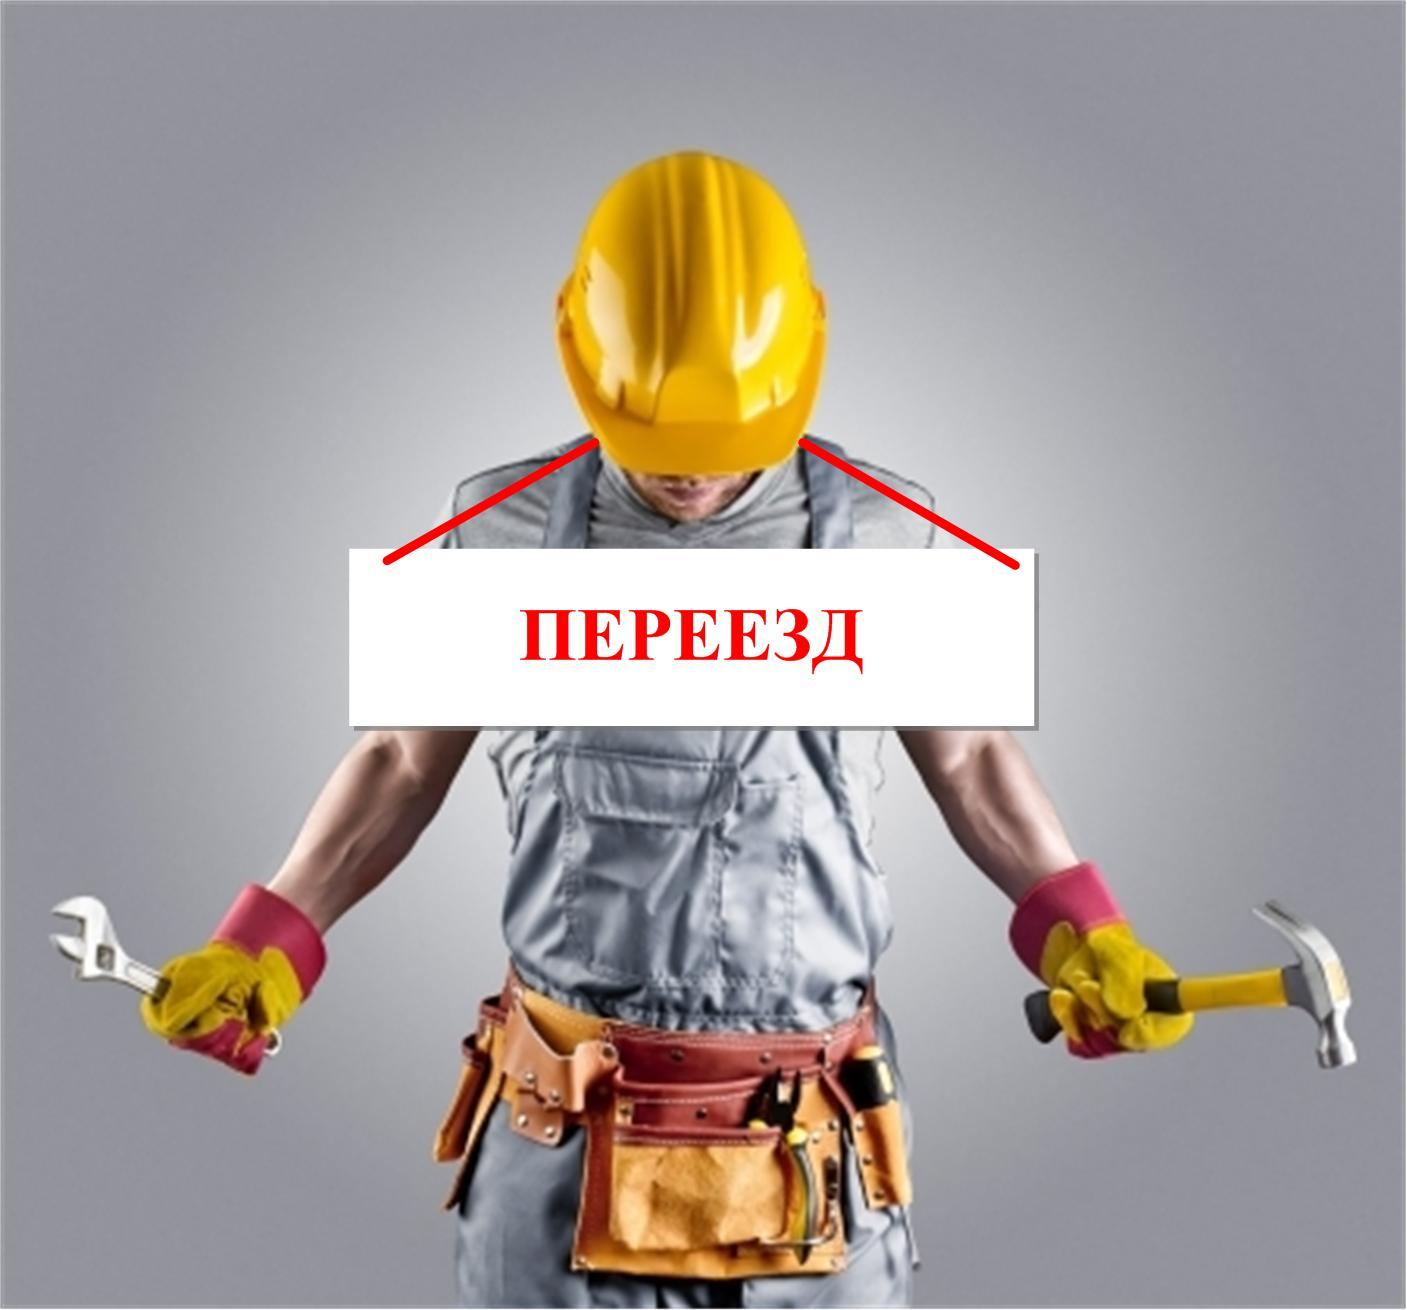 http://www.mingli.ru/repository/post/403/images/cbd8d25c7b9e319df23abf2cdce4780e.jpg